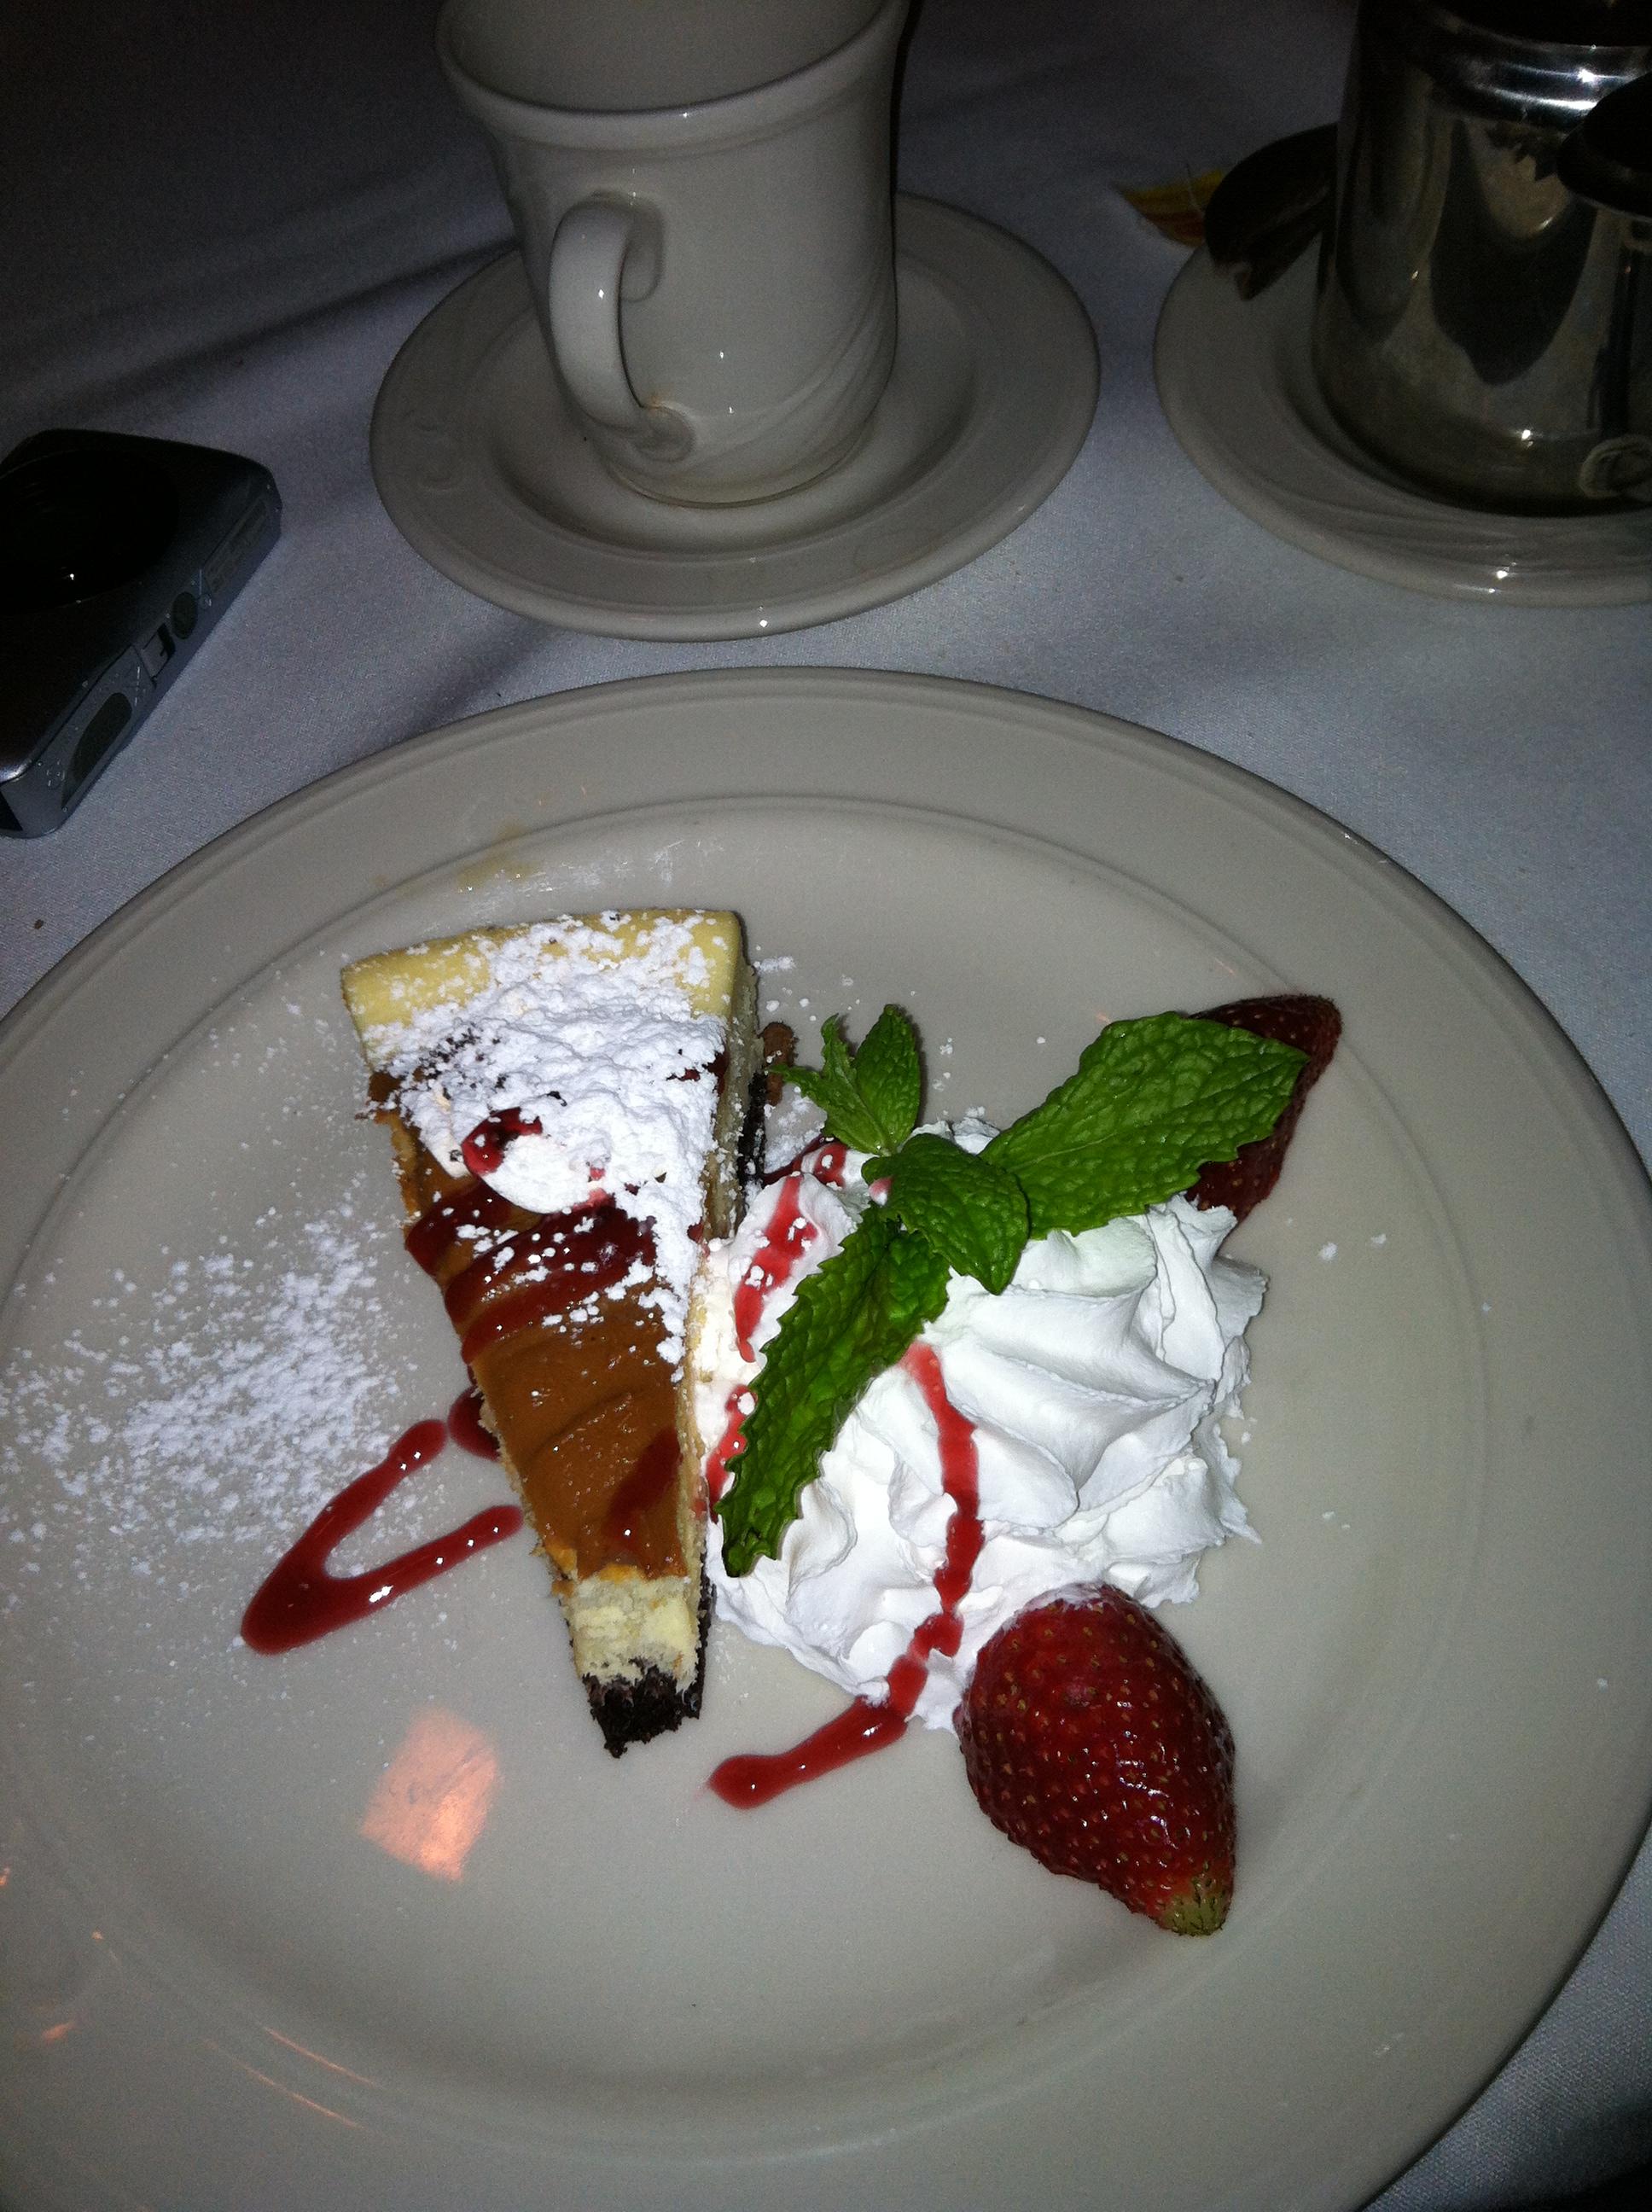 Yum...Caramel Cheesecake...Don't tell Lisa!